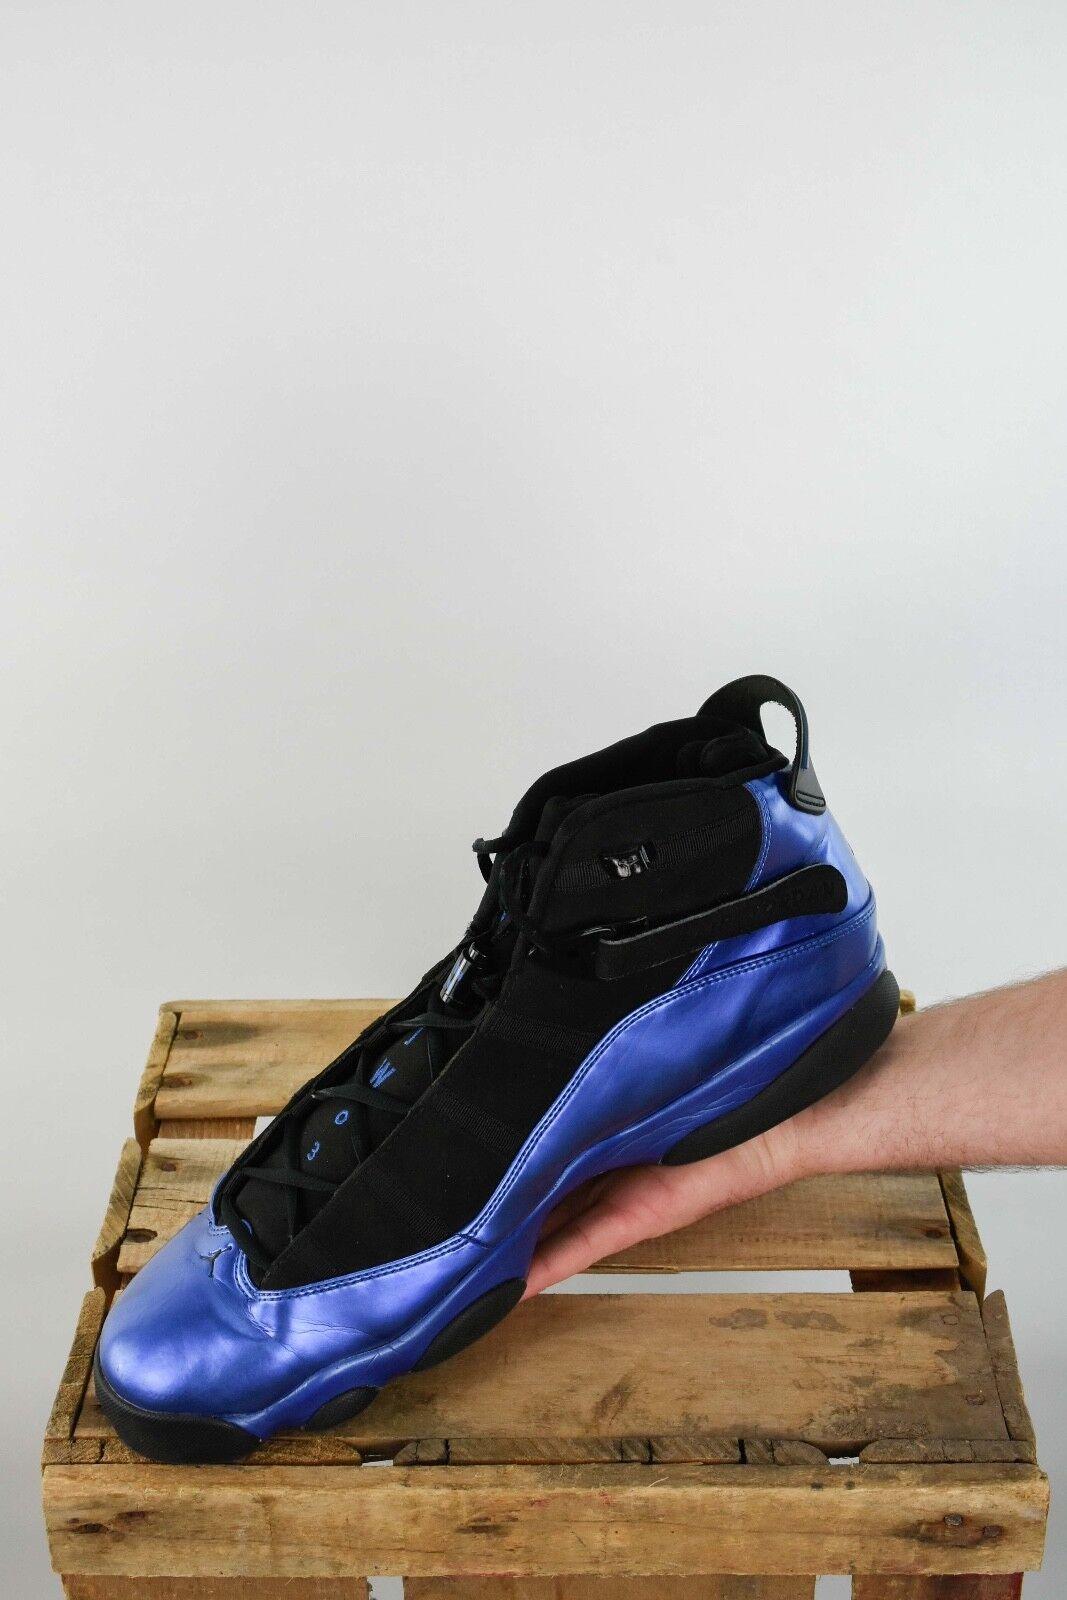 Vintage Jordan 6 Rings bleu SizeSIZE14 hommes Trainer SizeSIZE14 bleu // US 15 // EUR 49. 3c2608